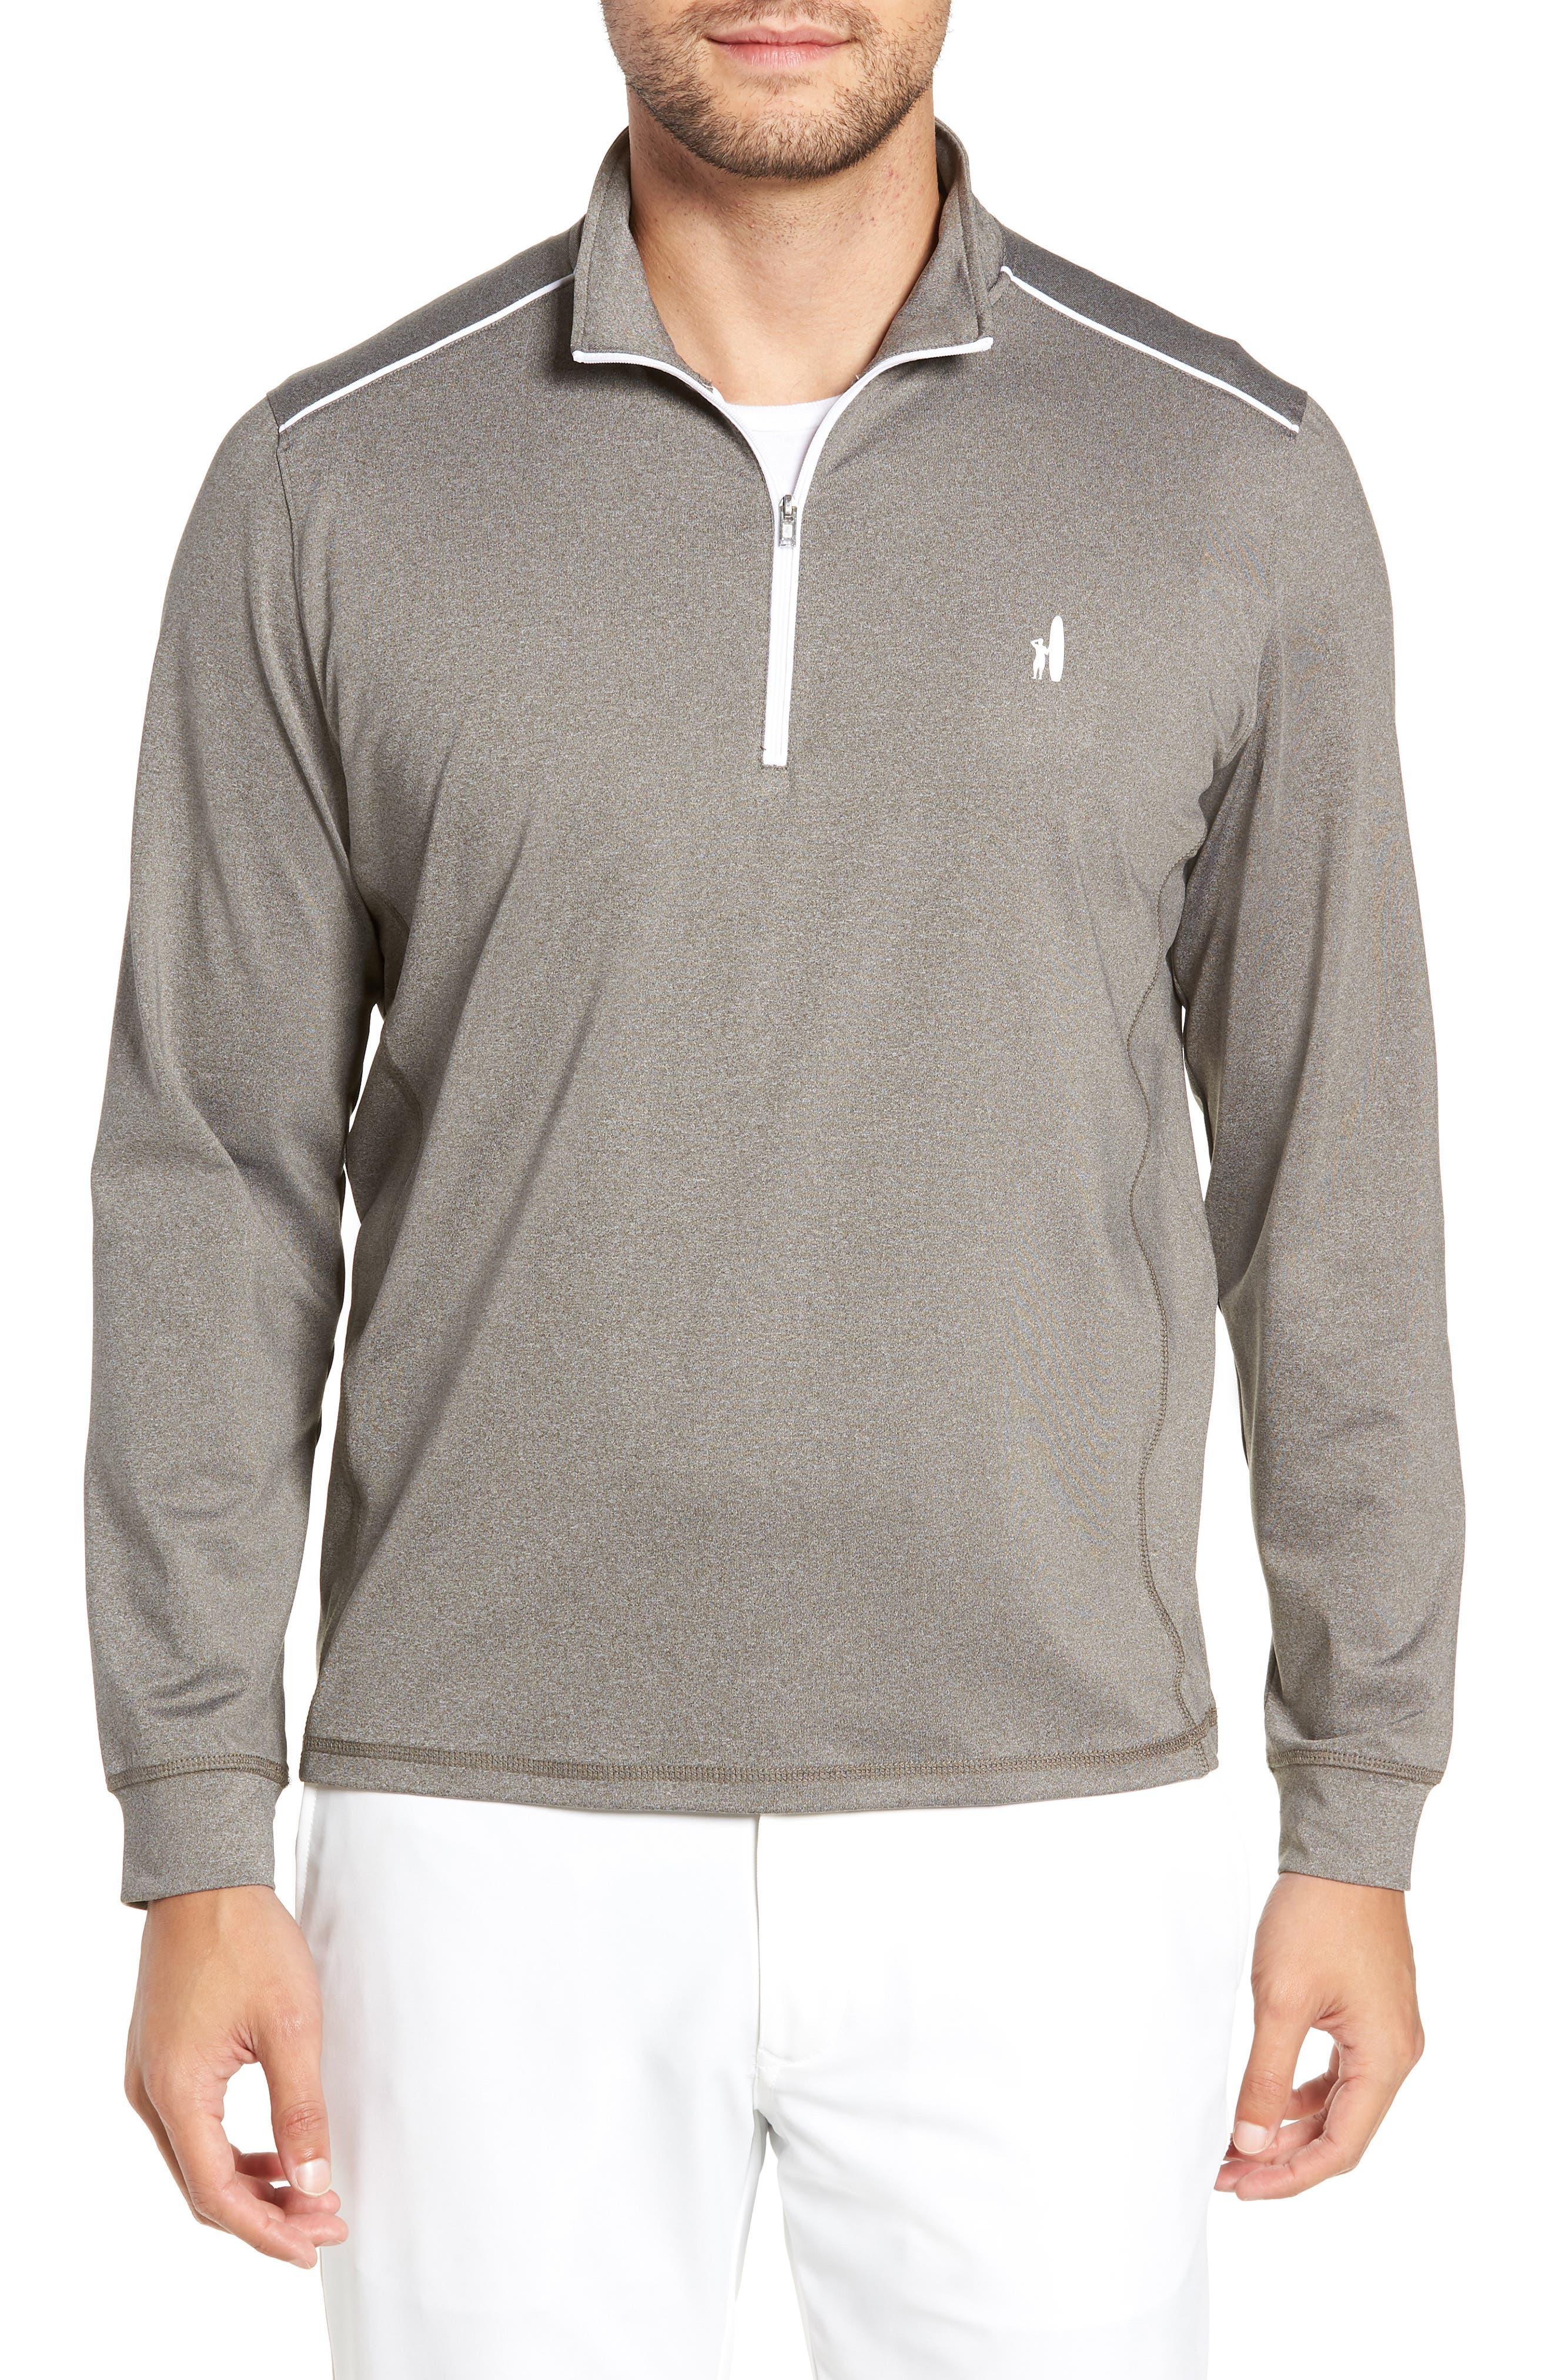 Lammie Regular Fit Quarter Zip Prep-Formance Pullover,                         Main,                         color, METEOR